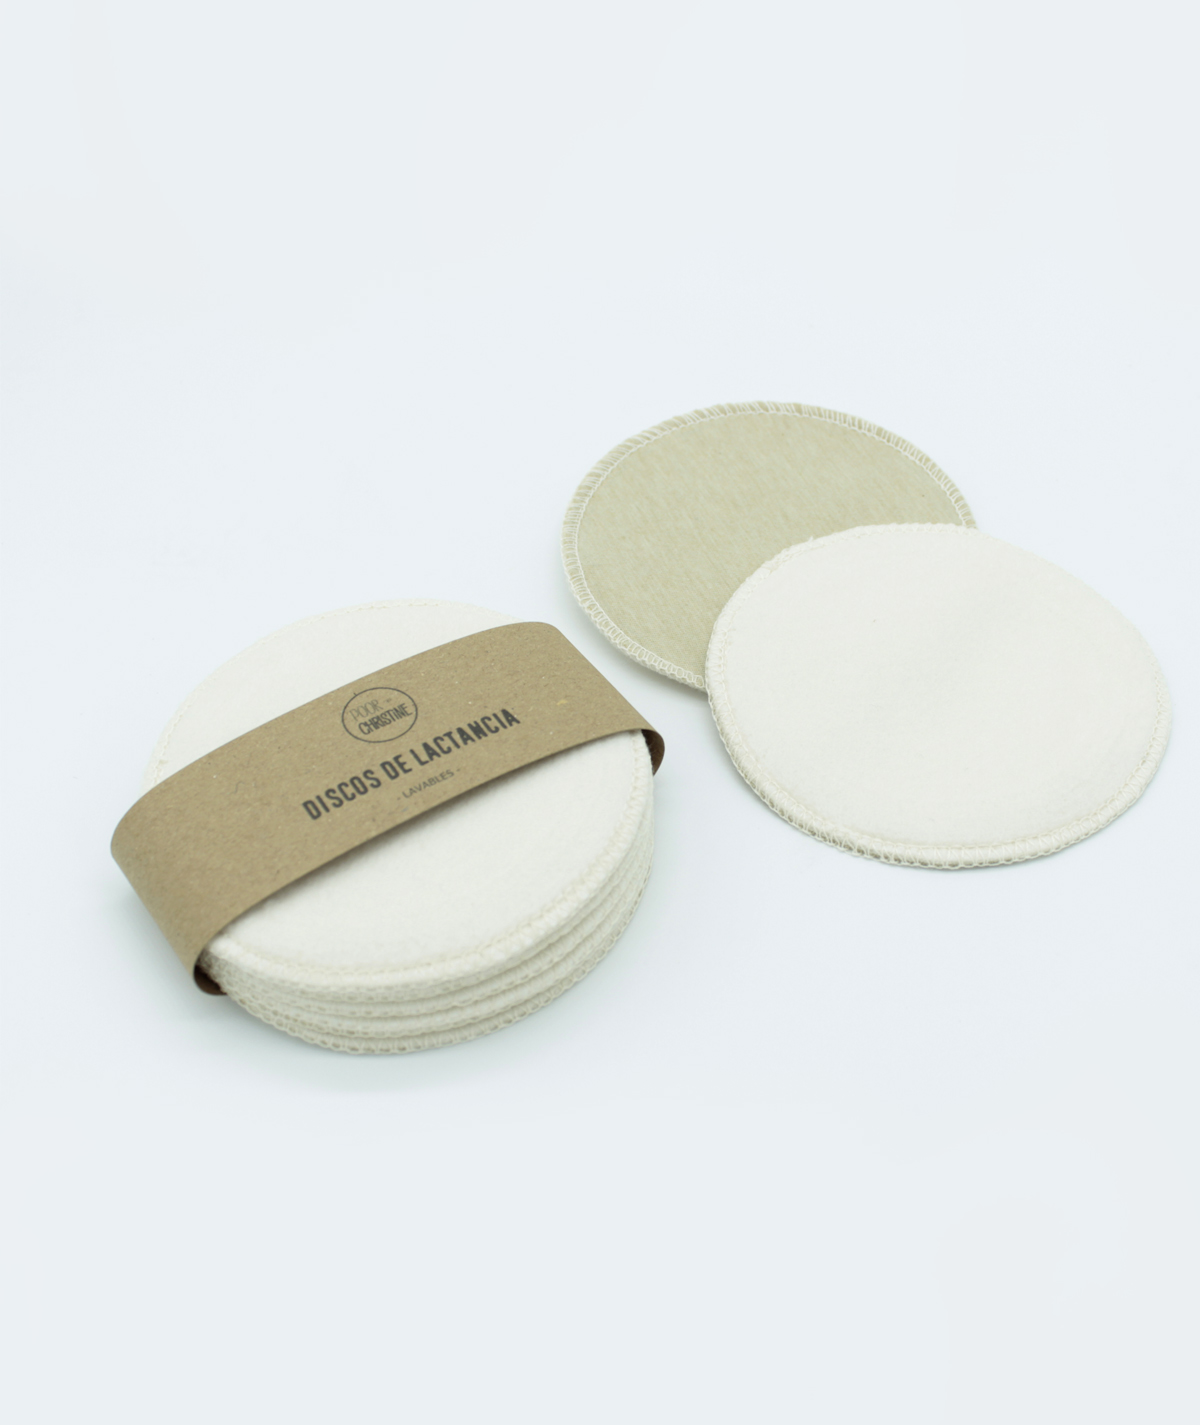 Pack 6 Discos de Lactancia de Algodón Orgánico